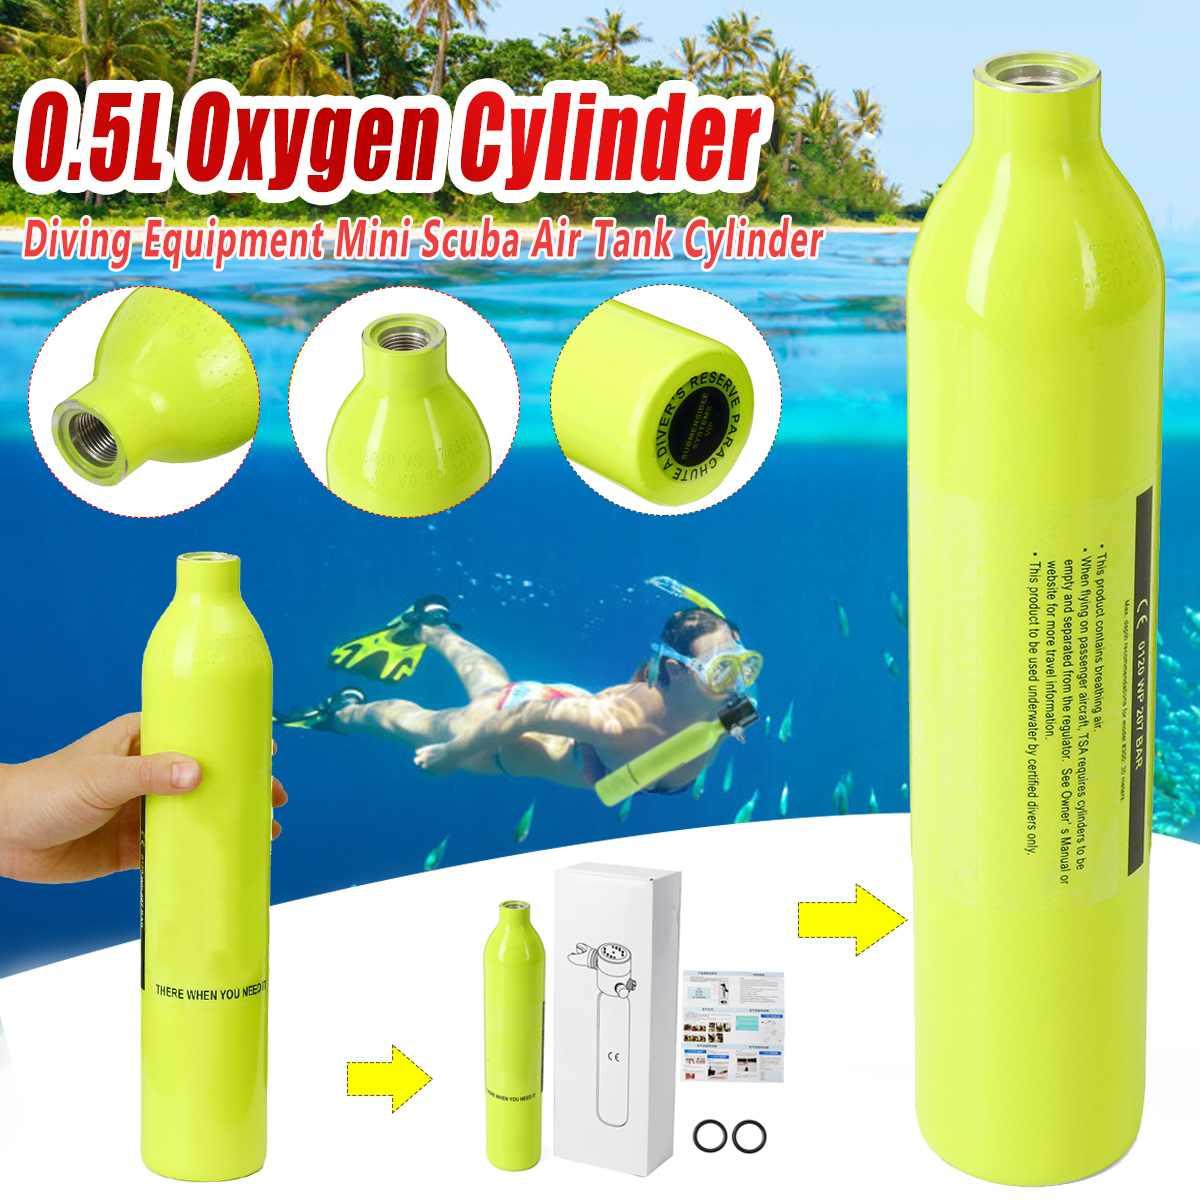 Diving Equipment 0.5L Mini Scuba Oxygen Air Tanks Cylinder Head Valve Mouthpiece Snorkeling Underwater Breathing DeviceDiving Equipment 0.5L Mini Scuba Oxygen Air Tanks Cylinder Head Valve Mouthpiece Snorkeling Underwater Breathing Device